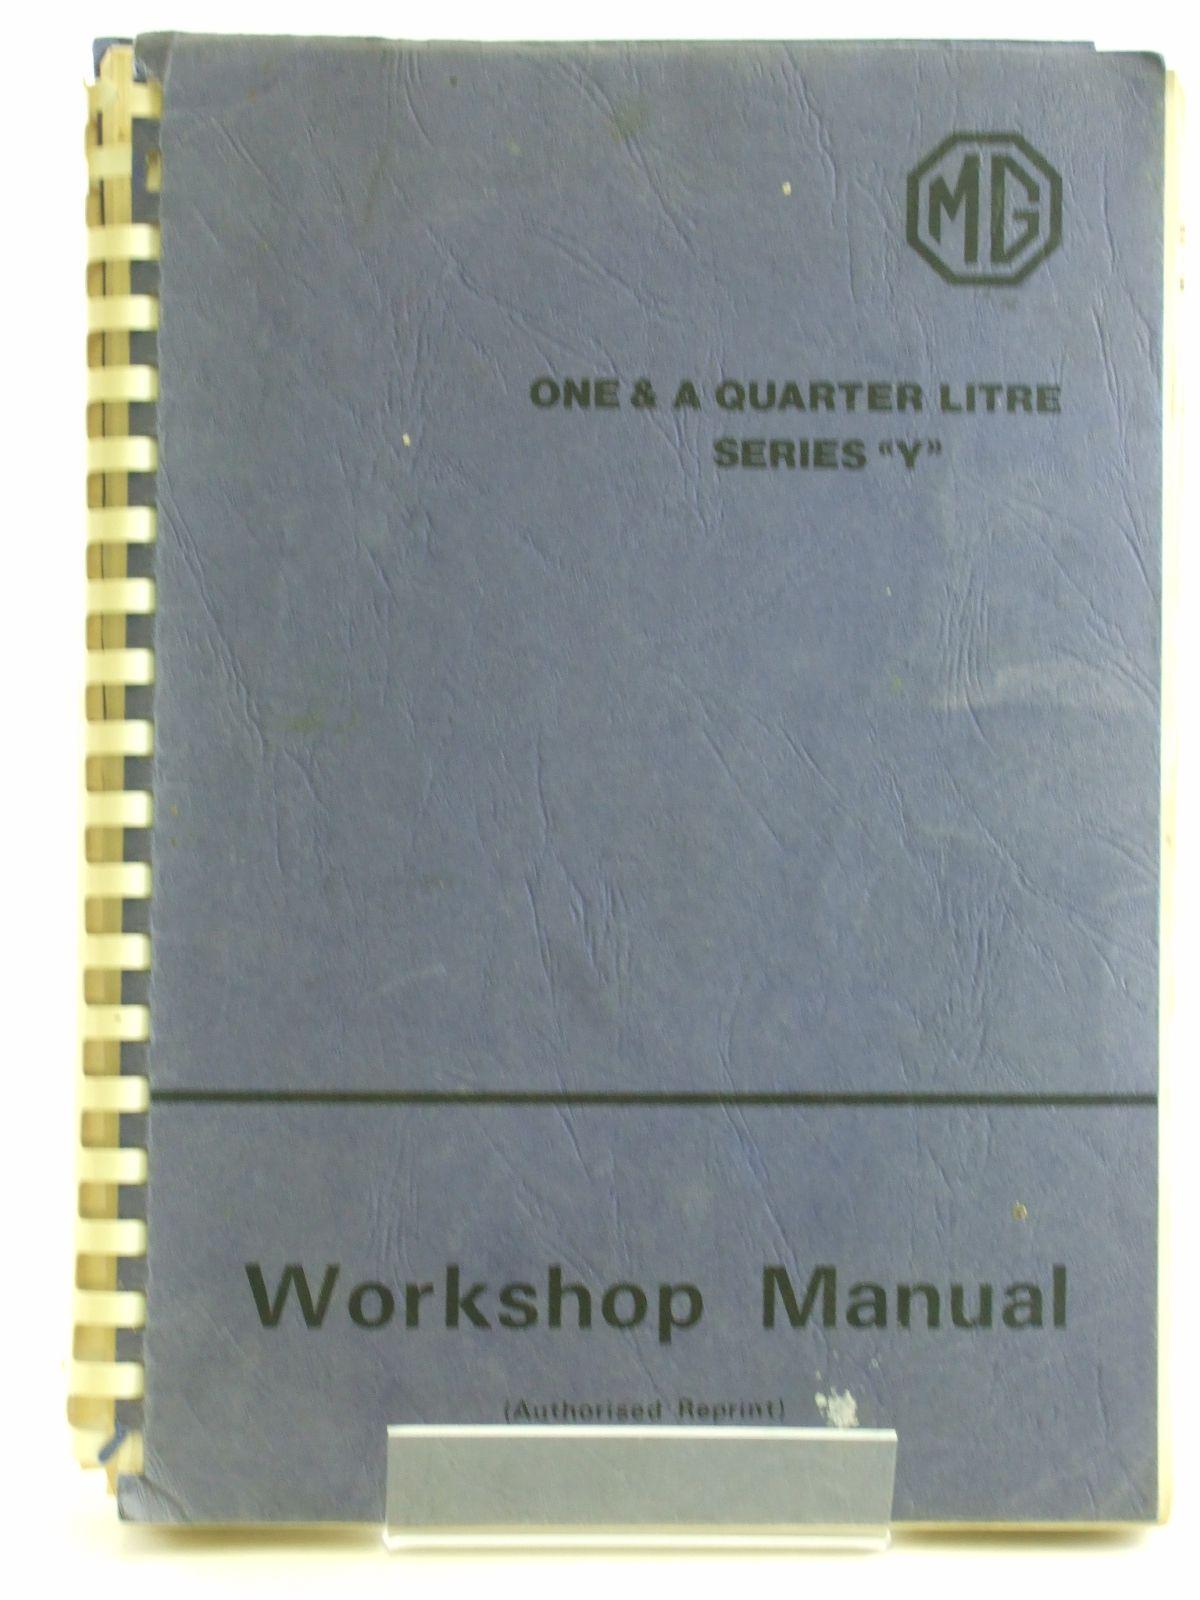 pfm 30 flow wrapper manual